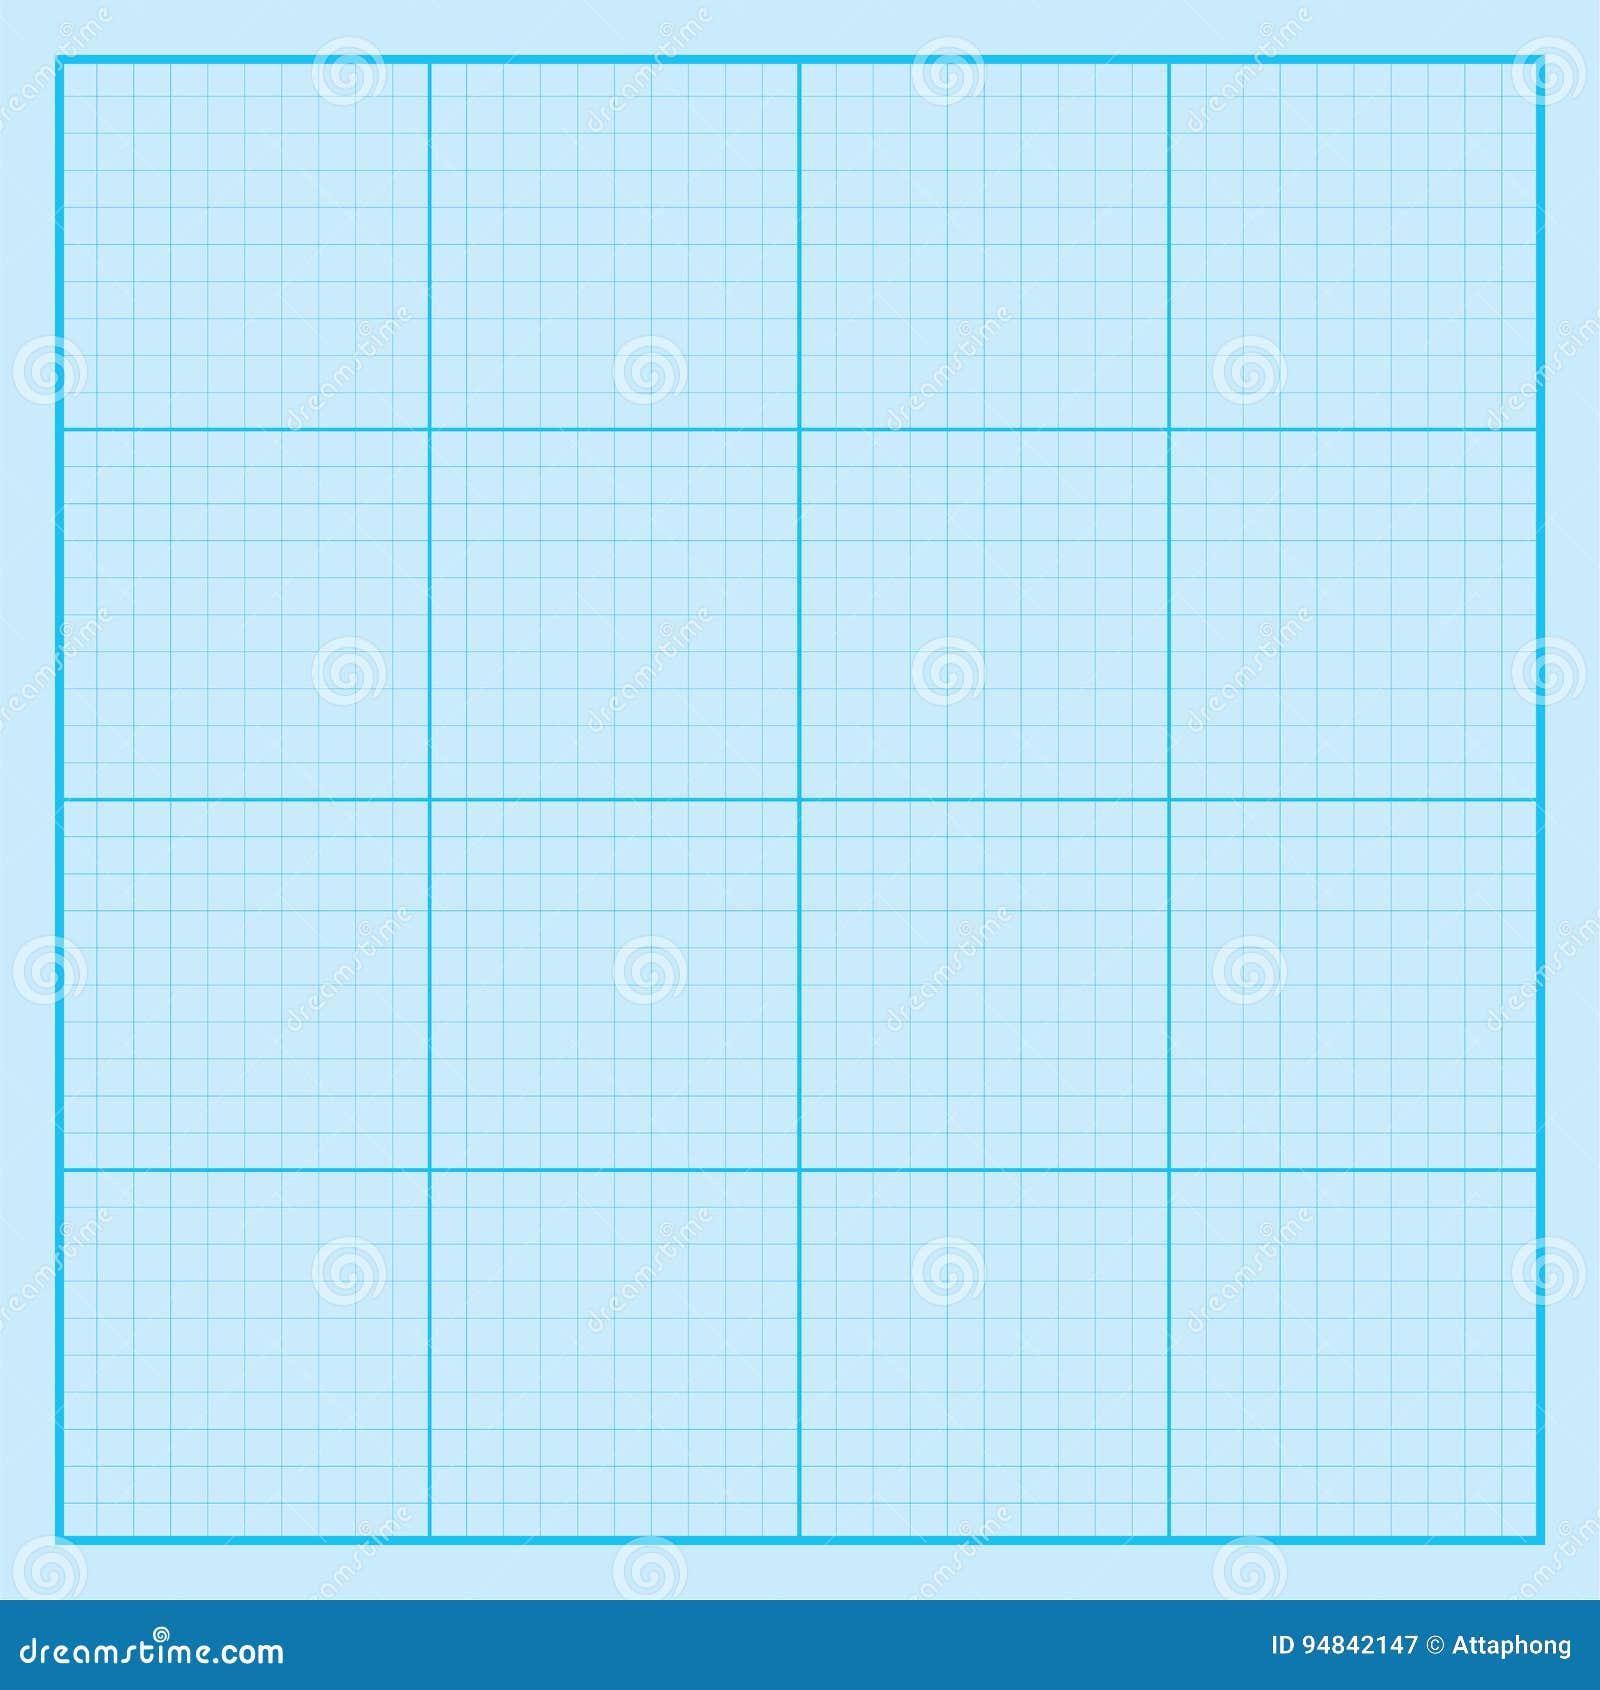 blue graph paper coordinate paper grid paper squared paper stock